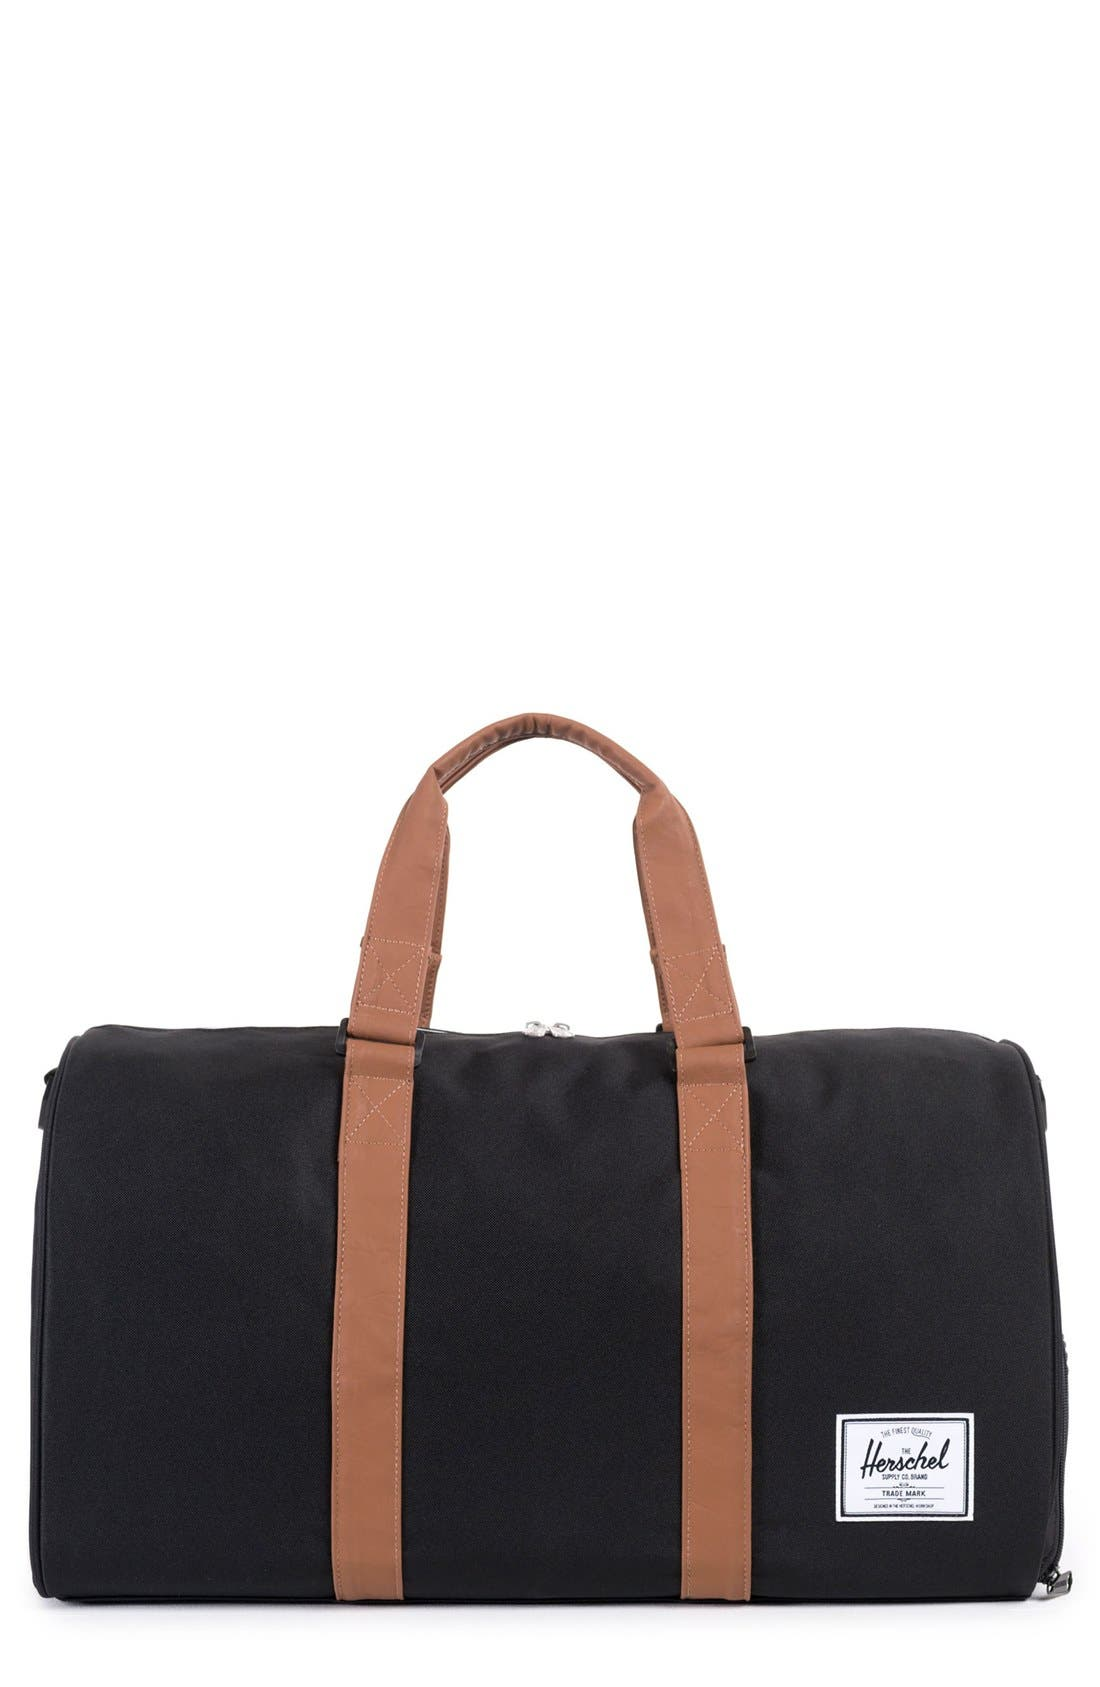 'Novel' Duffel Bag,                         Main,                         color, BLACK/ TAN